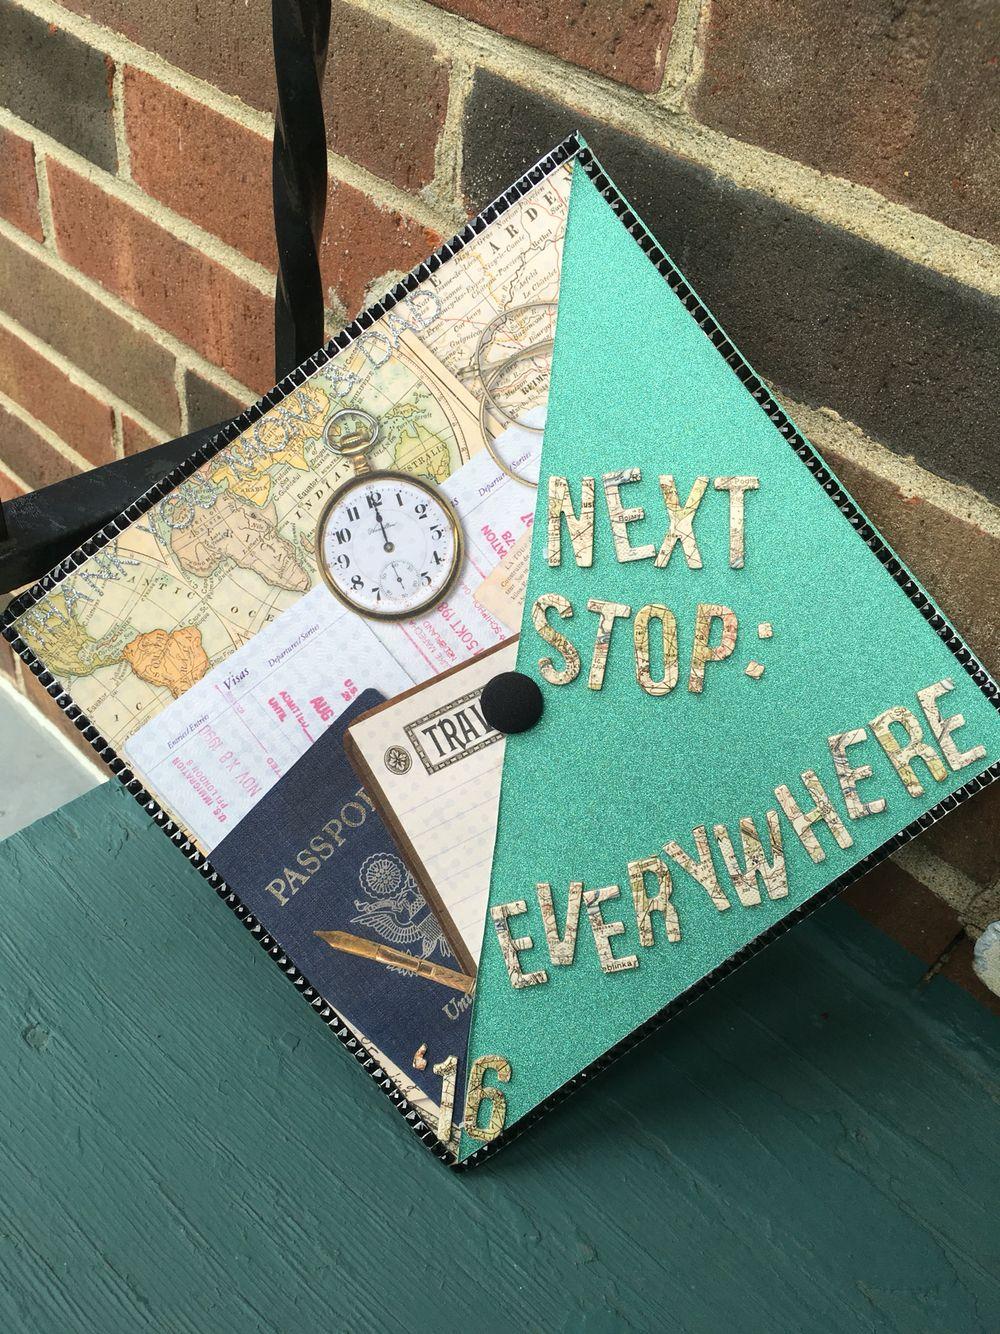 My Graduation Cap In The Top Left Corner It Reads Quot Thank